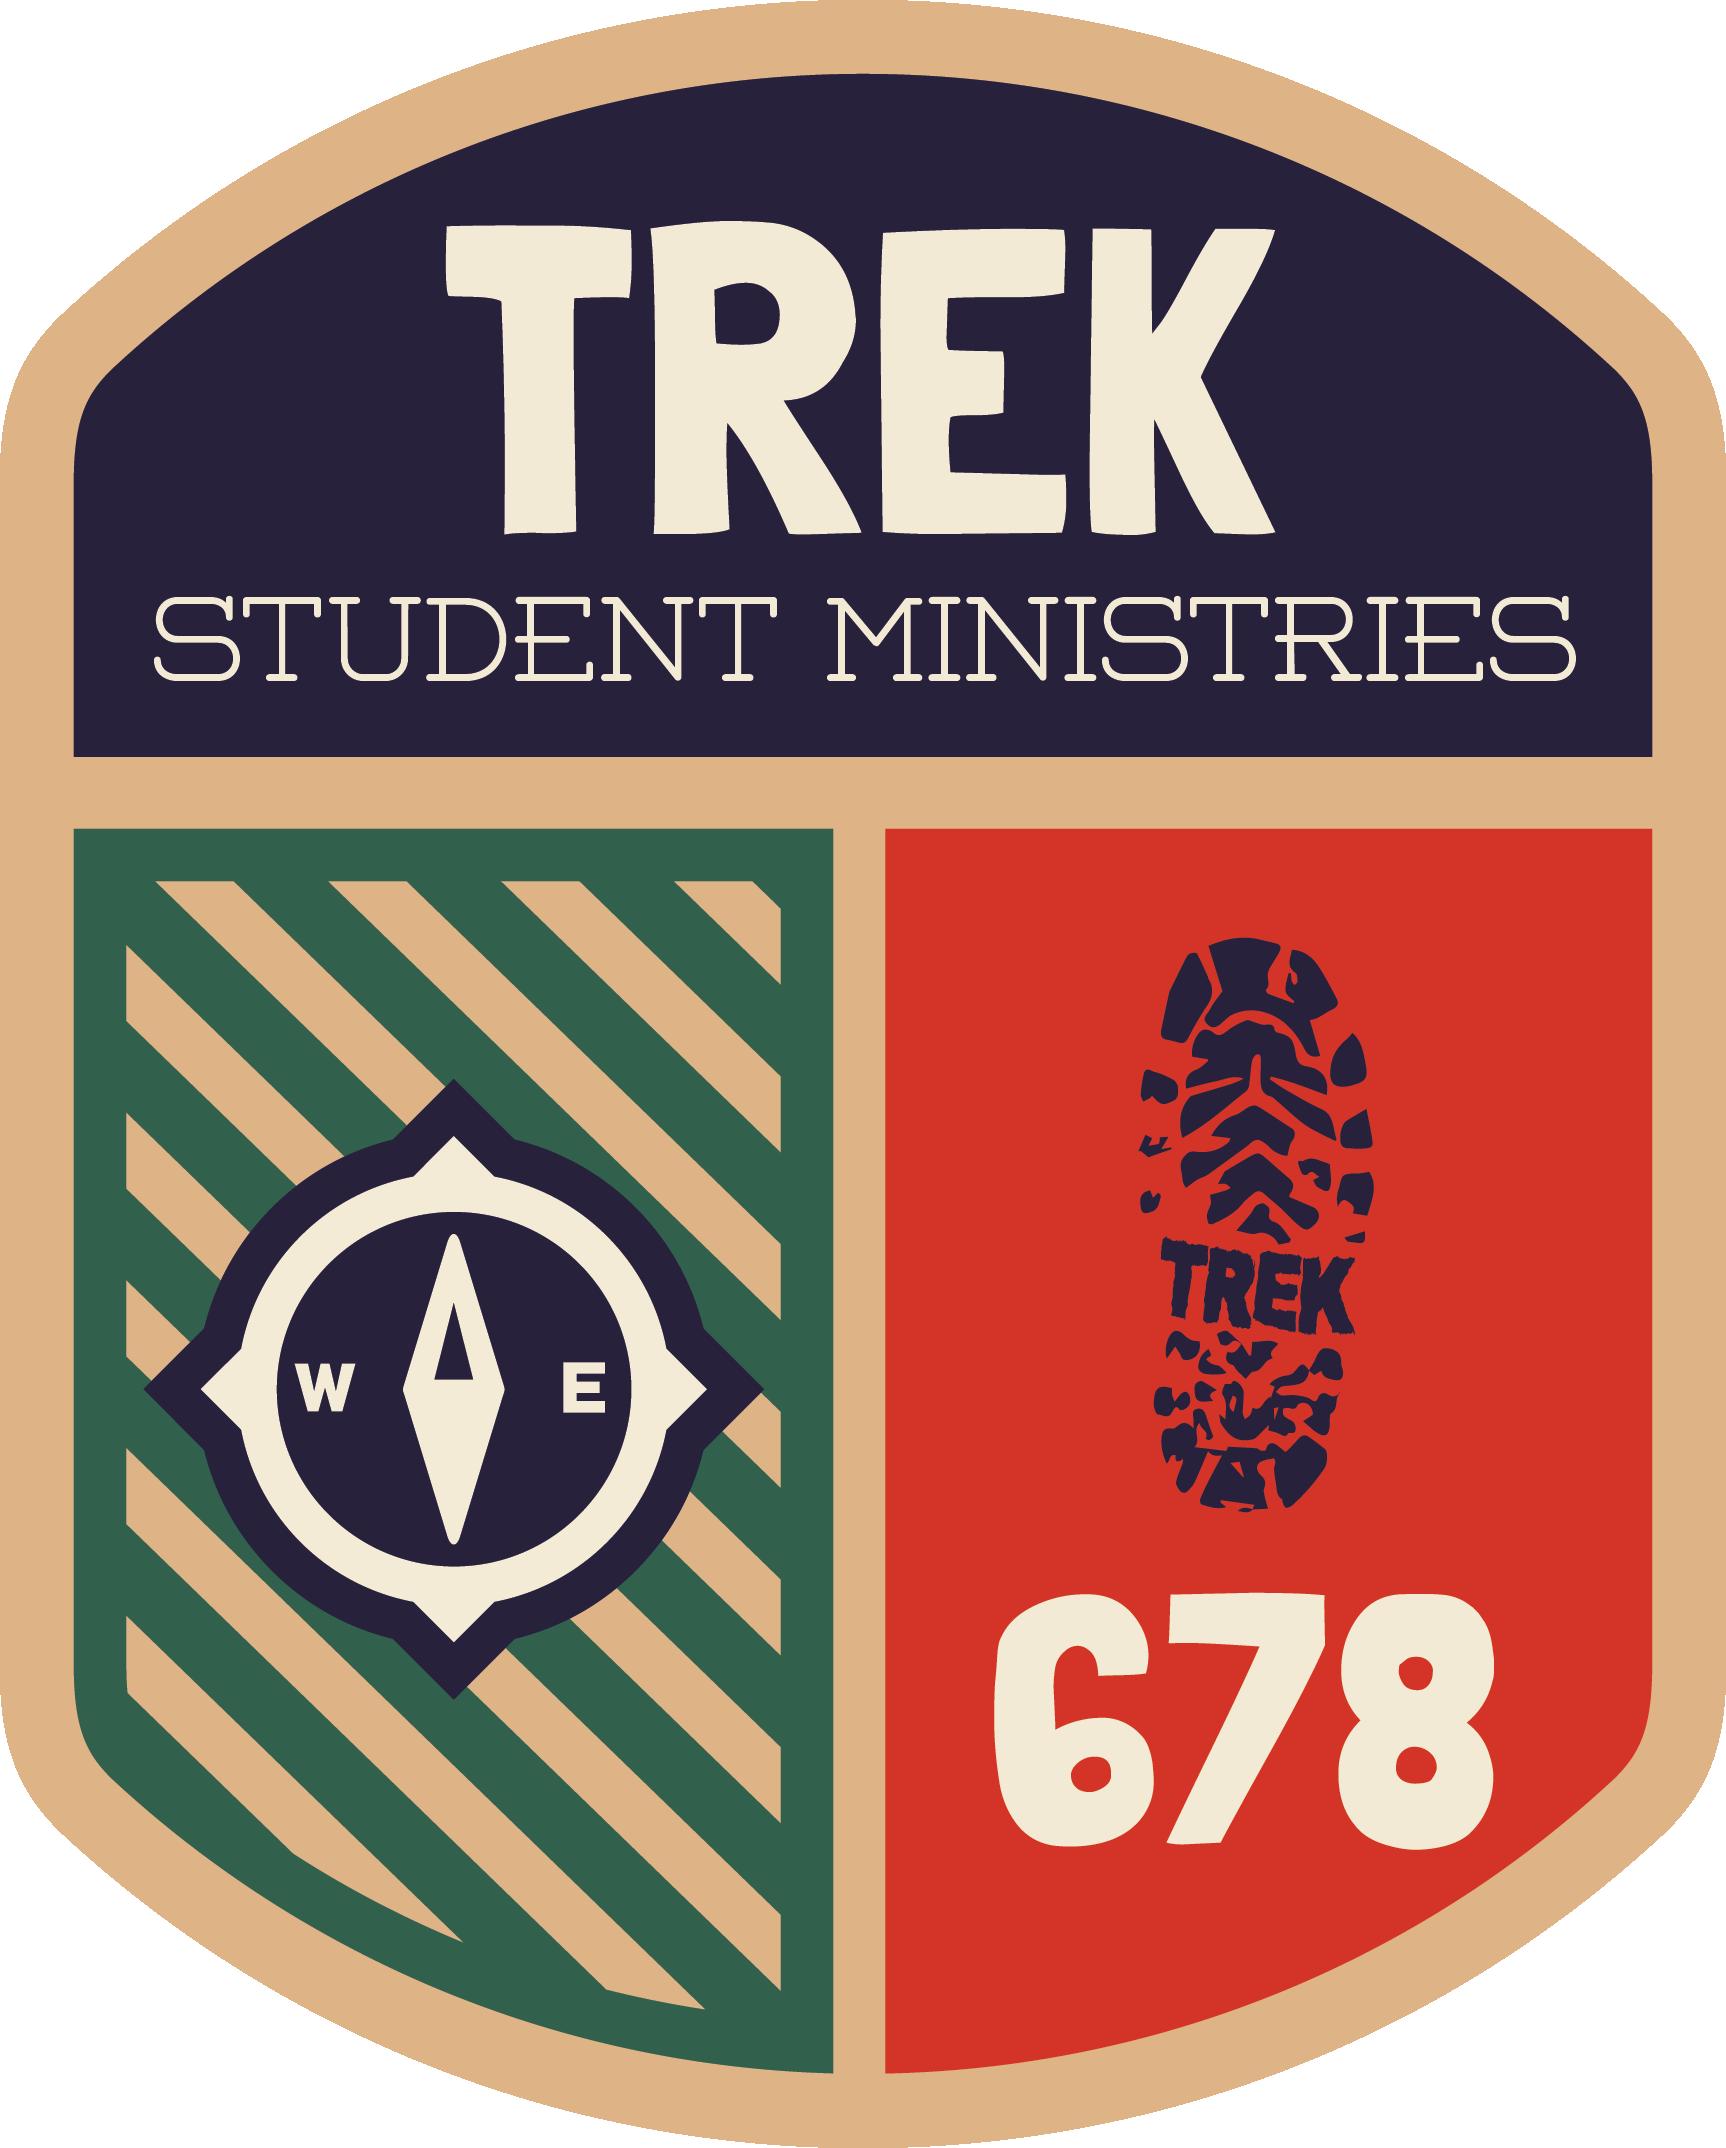 Trek Student Ministries color.png